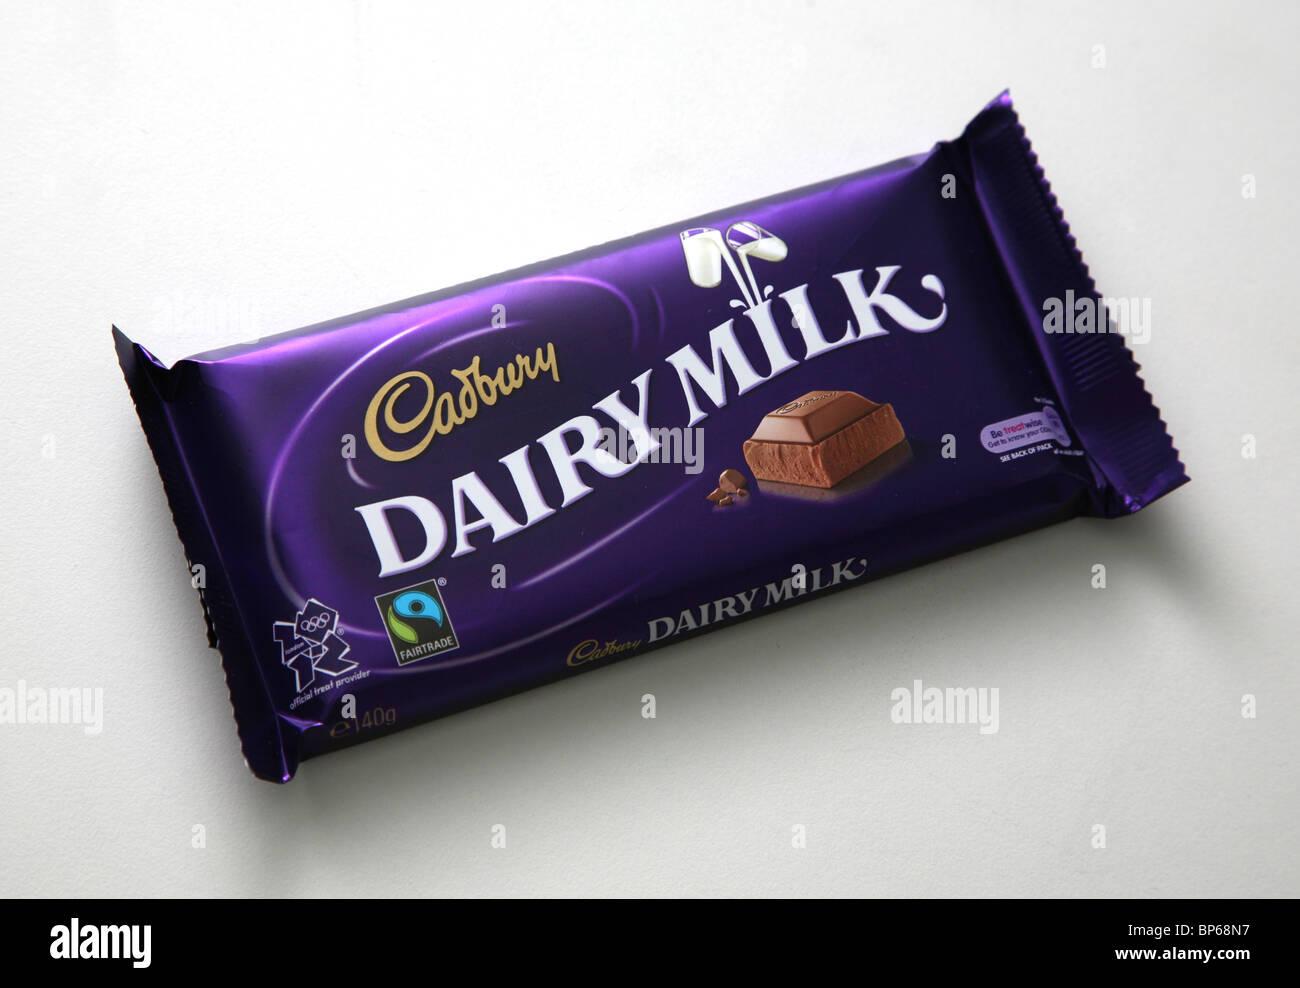 Chocolate Bar Wrapper Imágenes De Stock & Chocolate Bar Wrapper ...